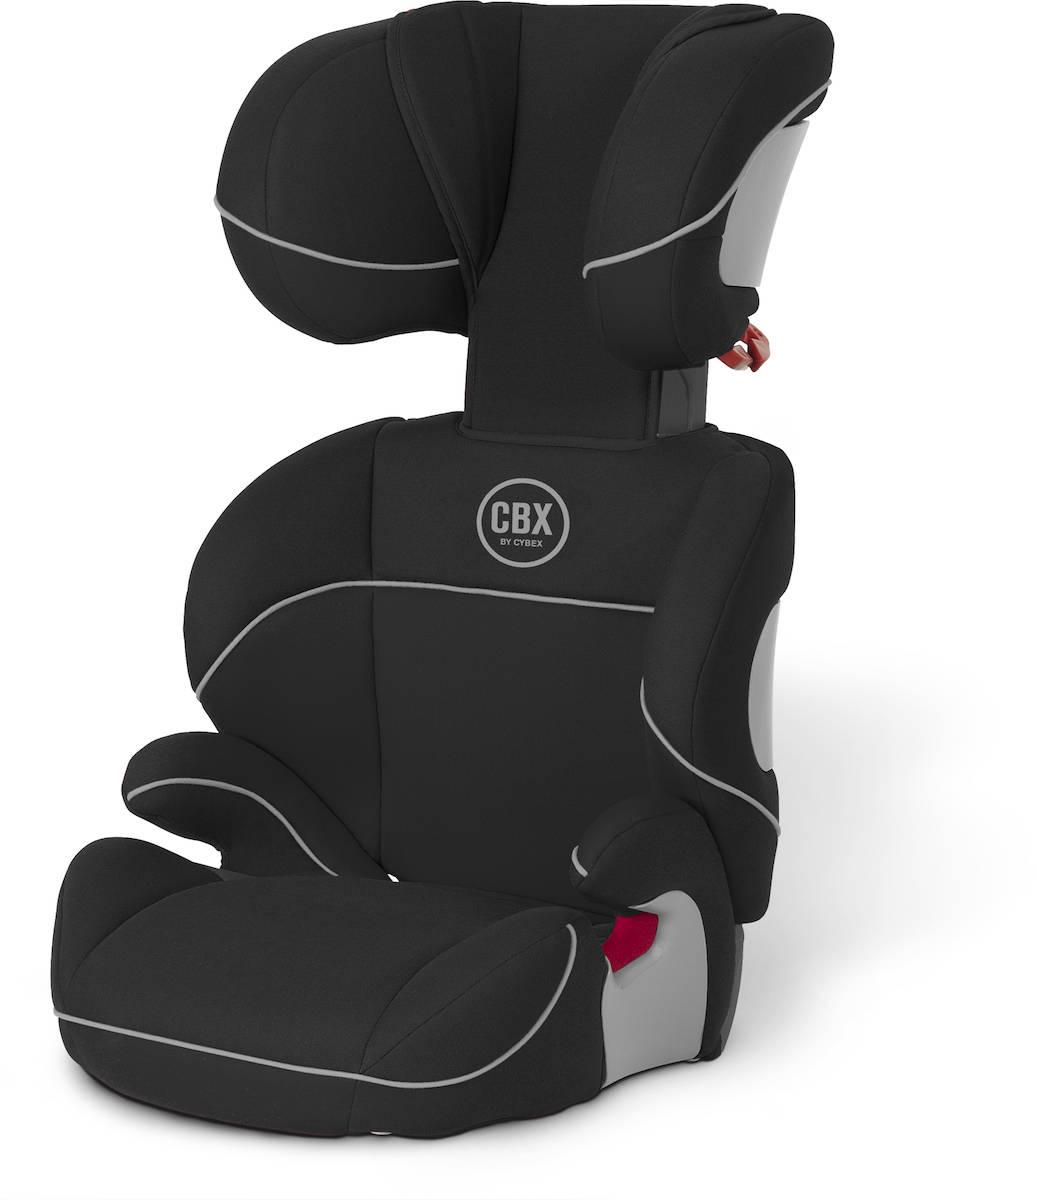 cybex solution turvaistuin 15 36 kg rajoitettu er. Black Bedroom Furniture Sets. Home Design Ideas